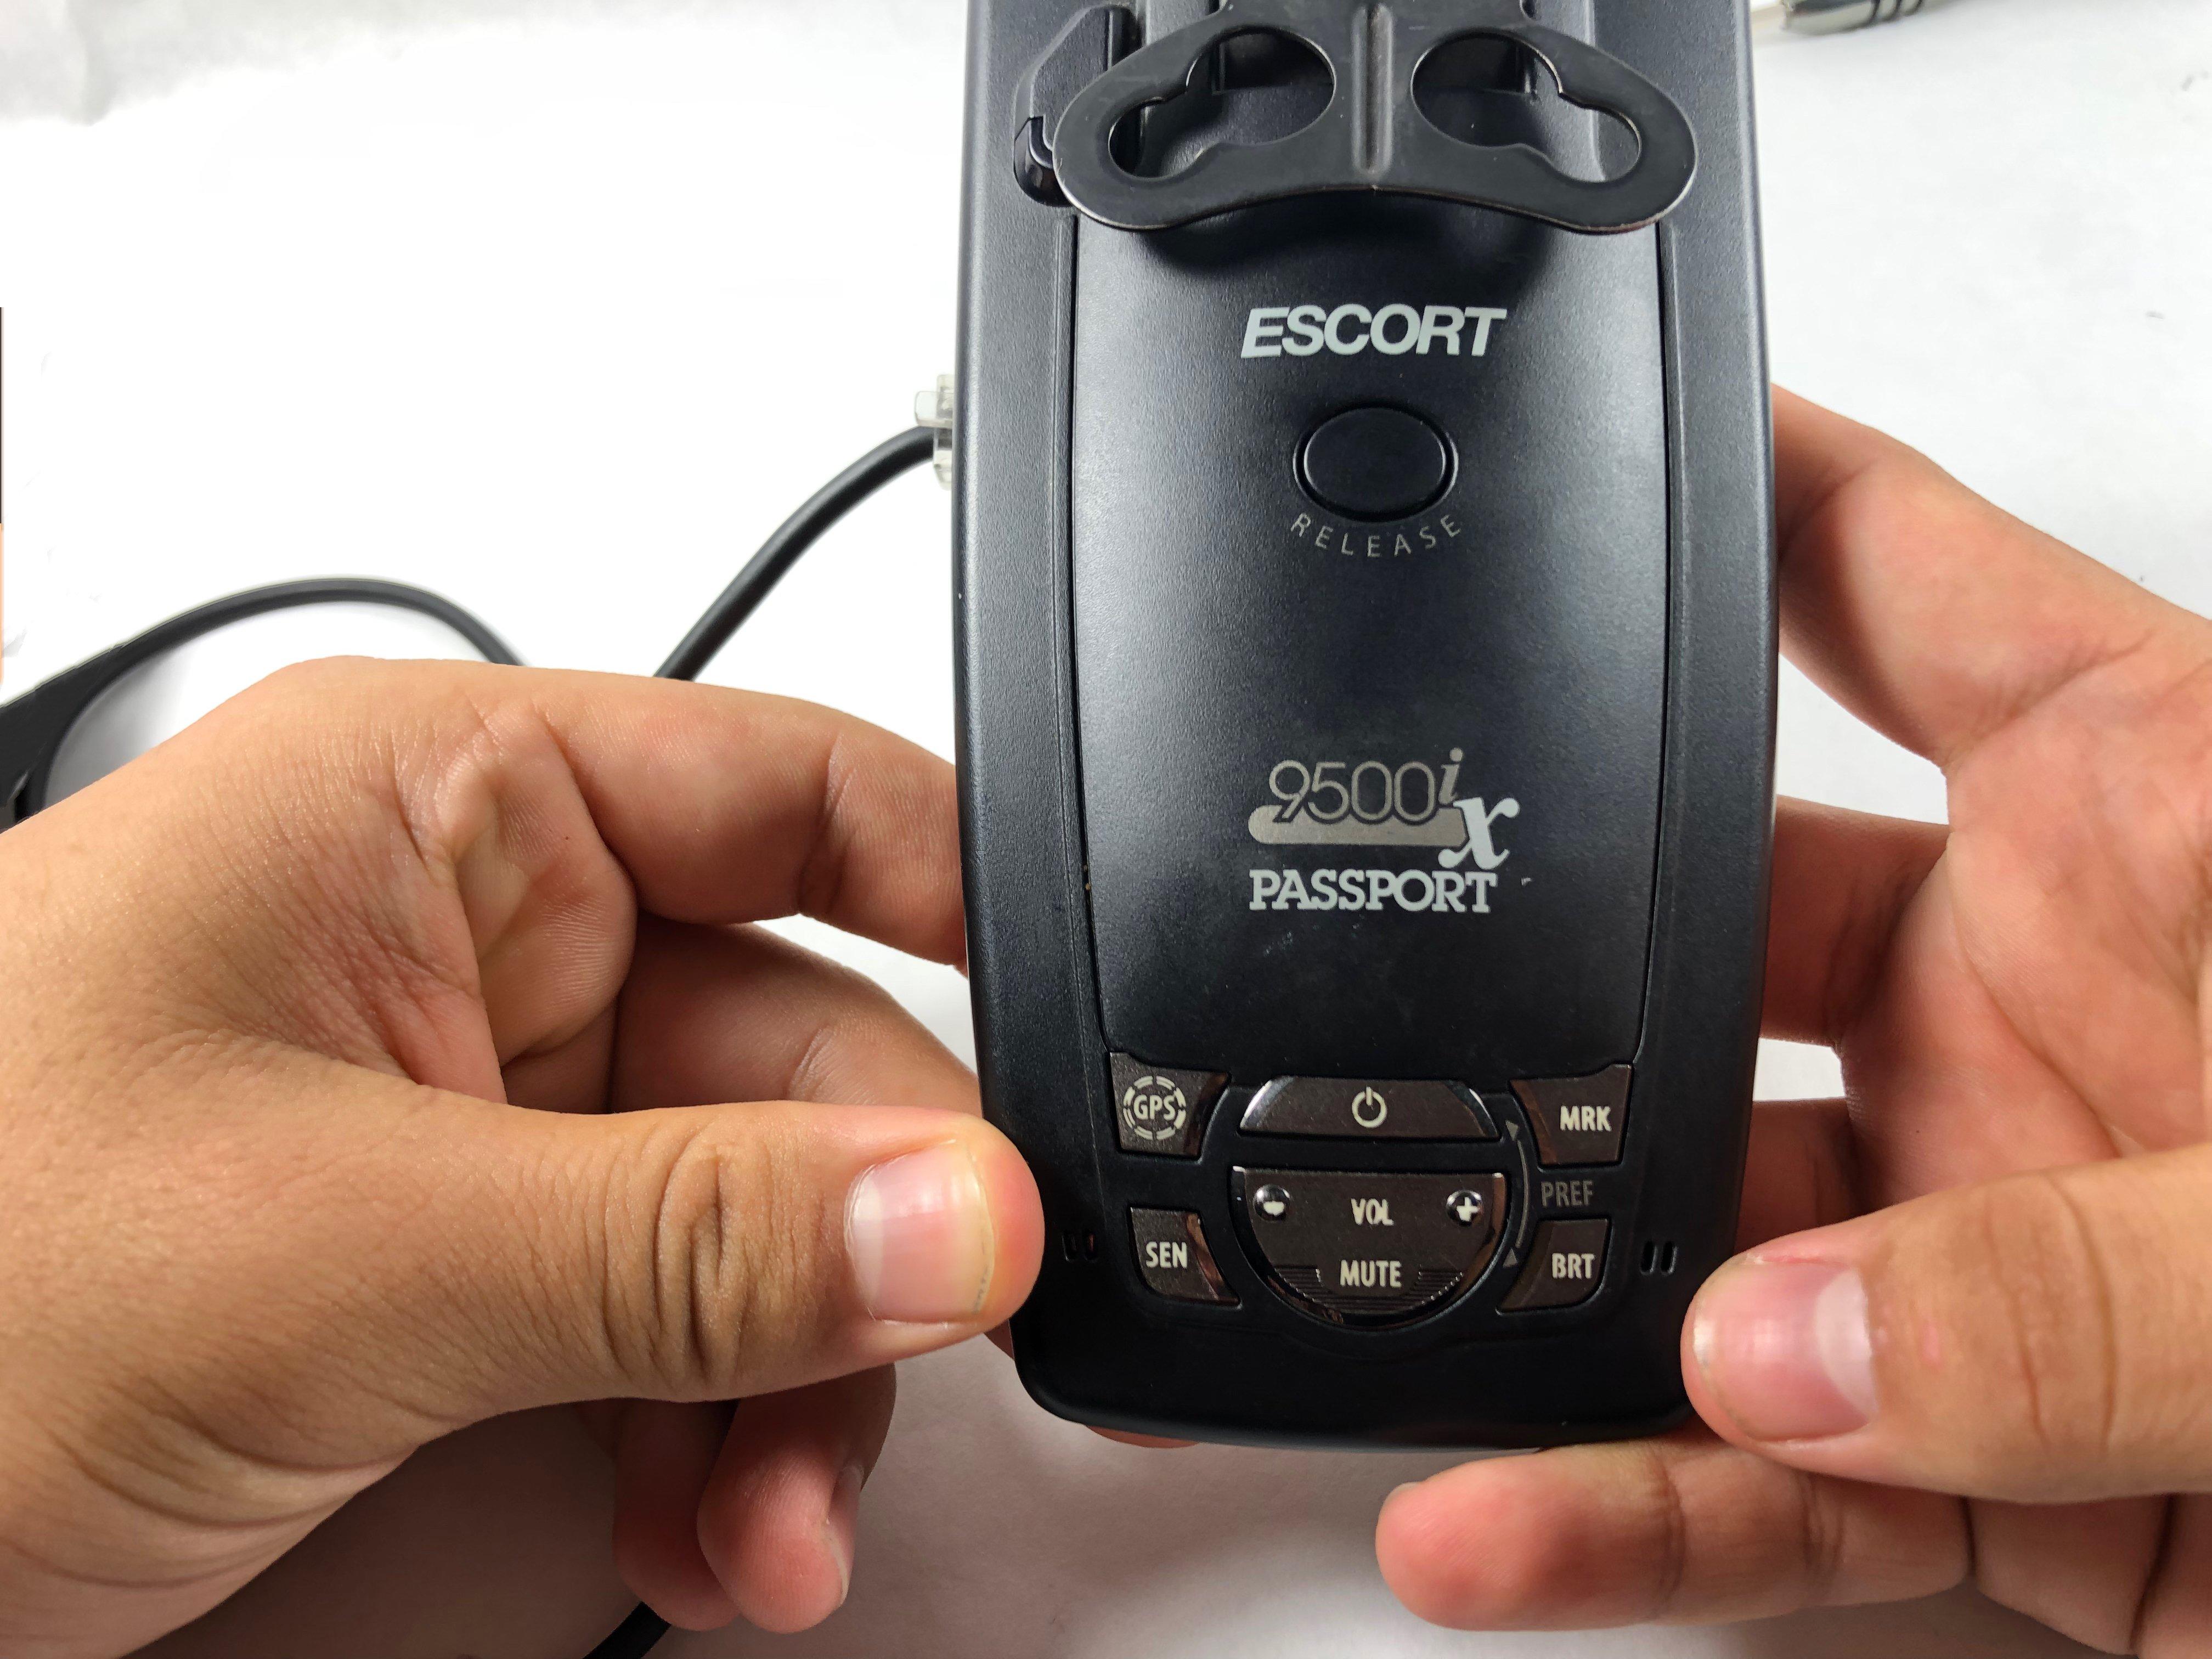 Escort Passport 9500Ix >> Escort Passport 9500ix Button Replacement Ifixit Tamir Kilavuzu